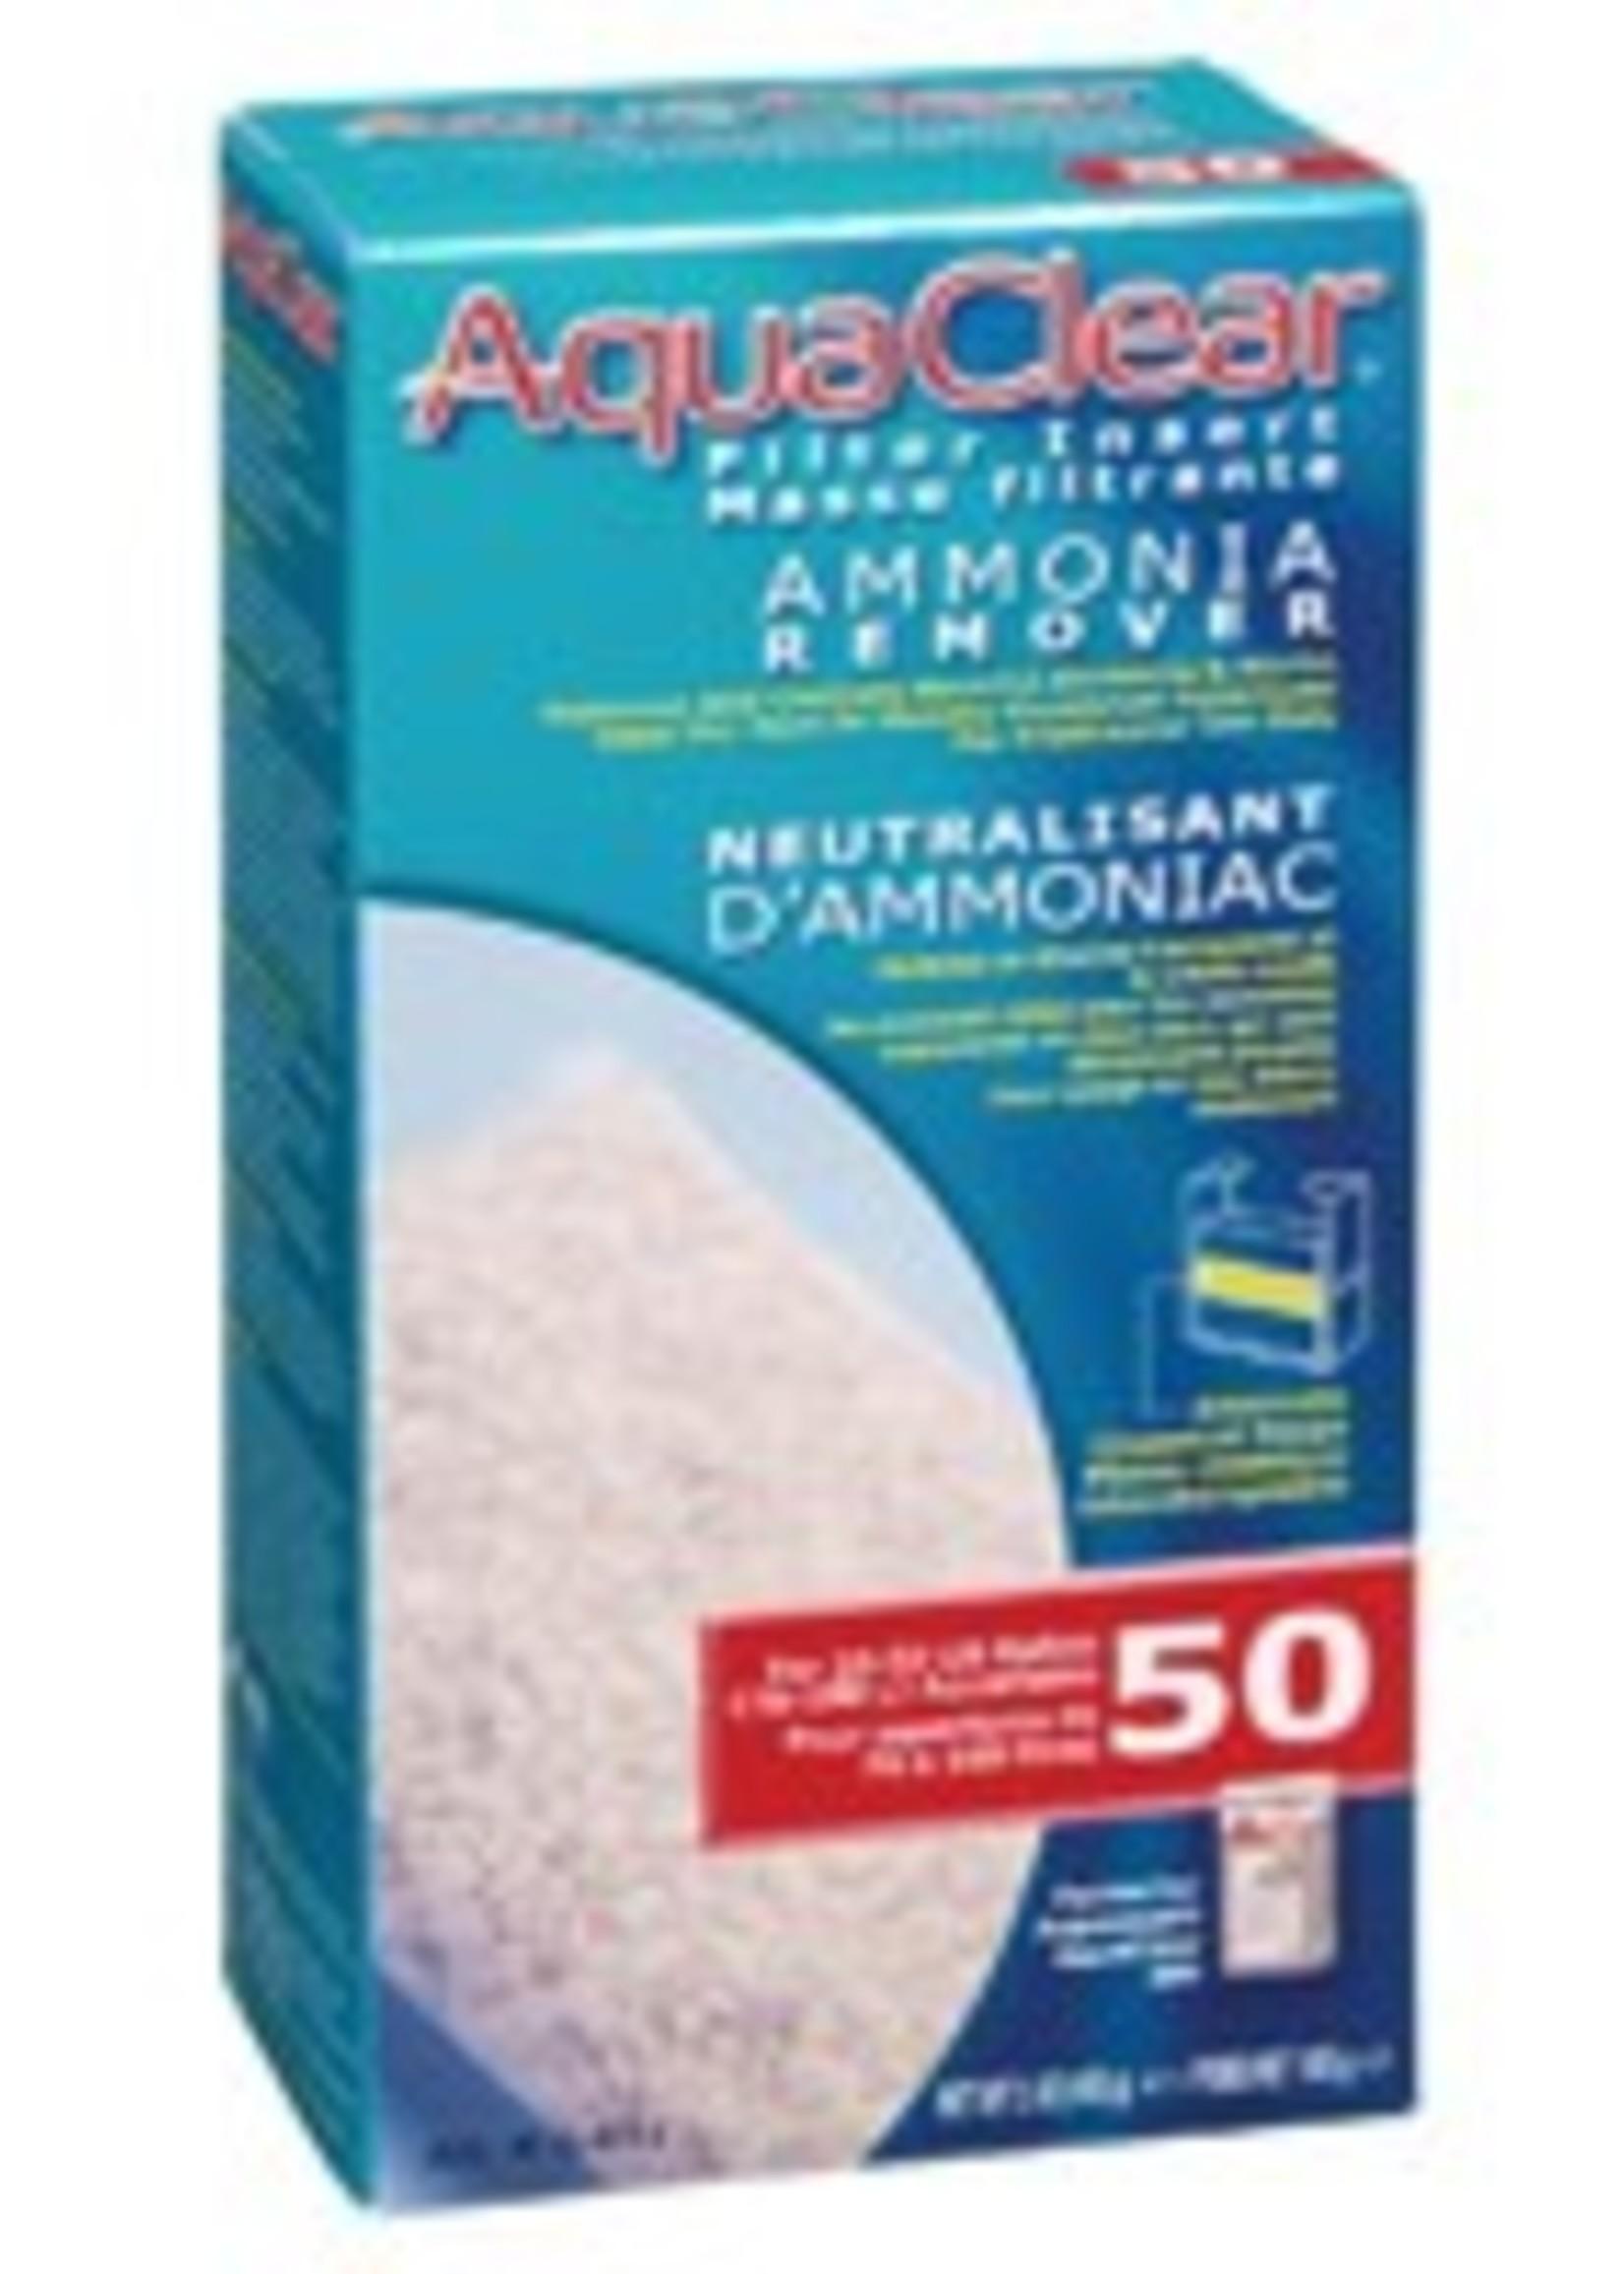 AquaClear 50 Ammonia Remover Filter Insert, 143g (5 oz)